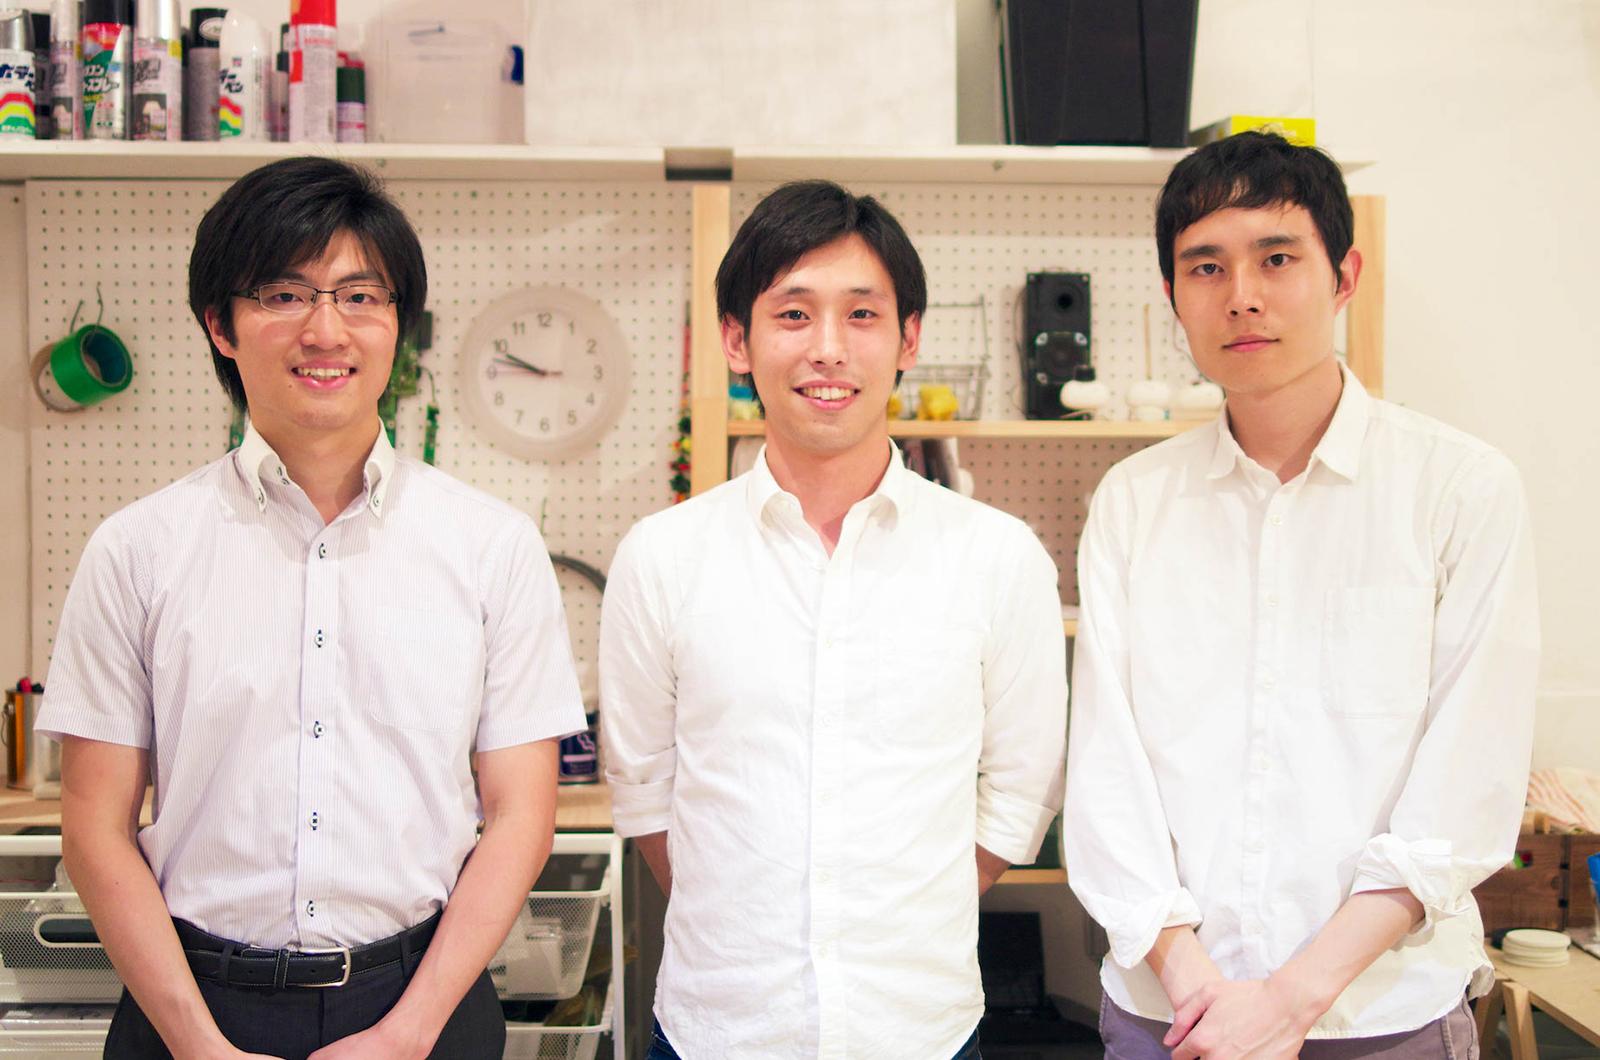 Ginger Design Studioの暮橋昌宏さん(左)、横尾俊輔さん(中)と星野泰漢さん(右)。3人とも学生時代からの仲間